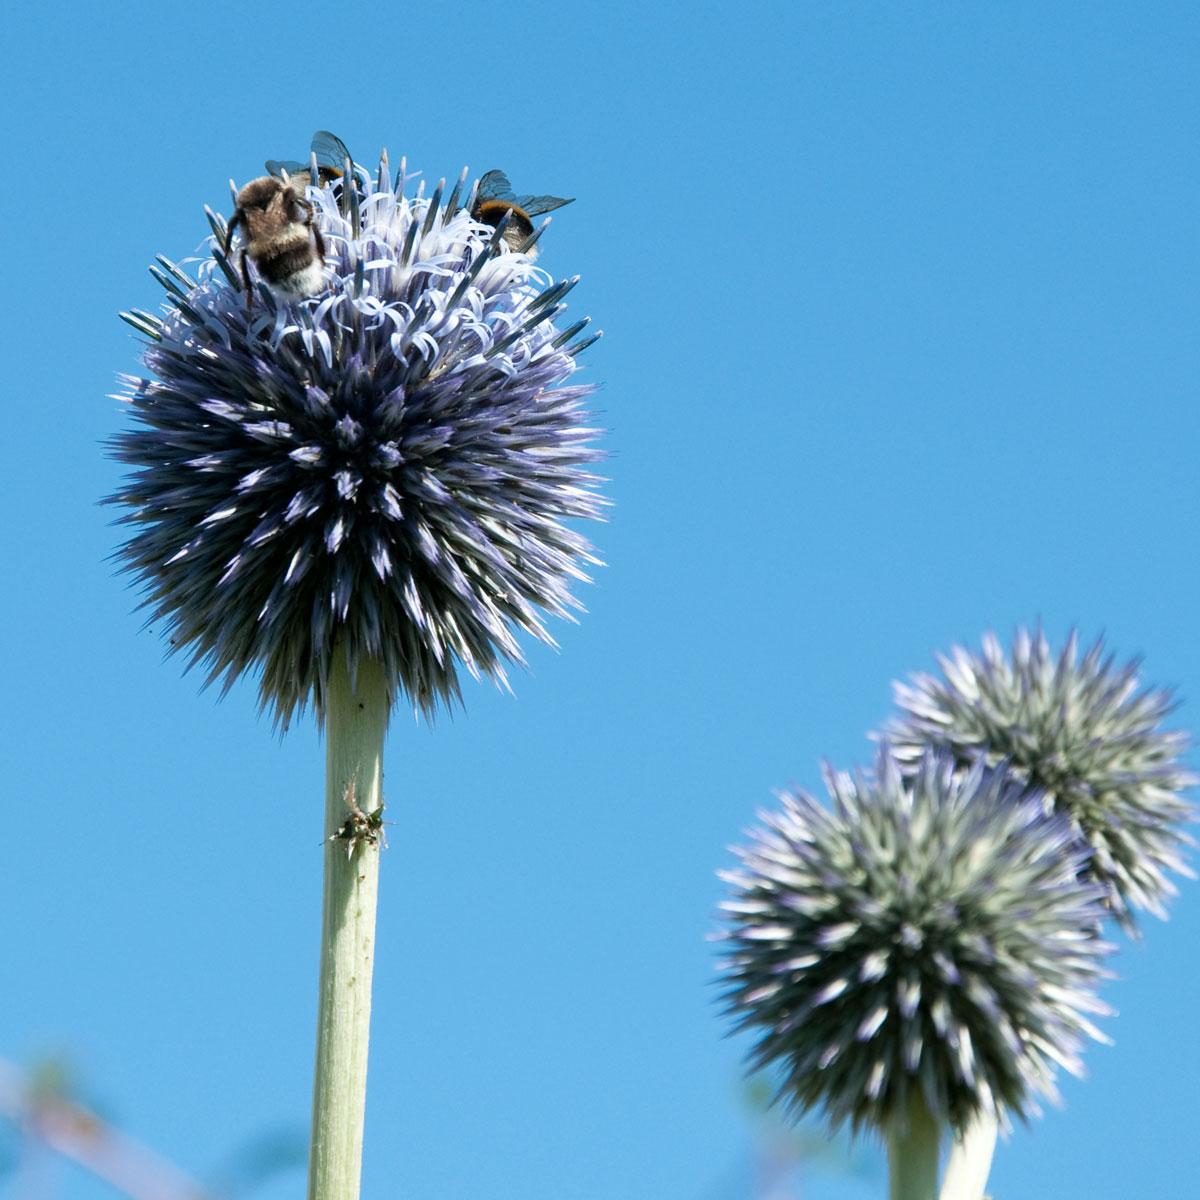 Bumblebees on Echinops flower